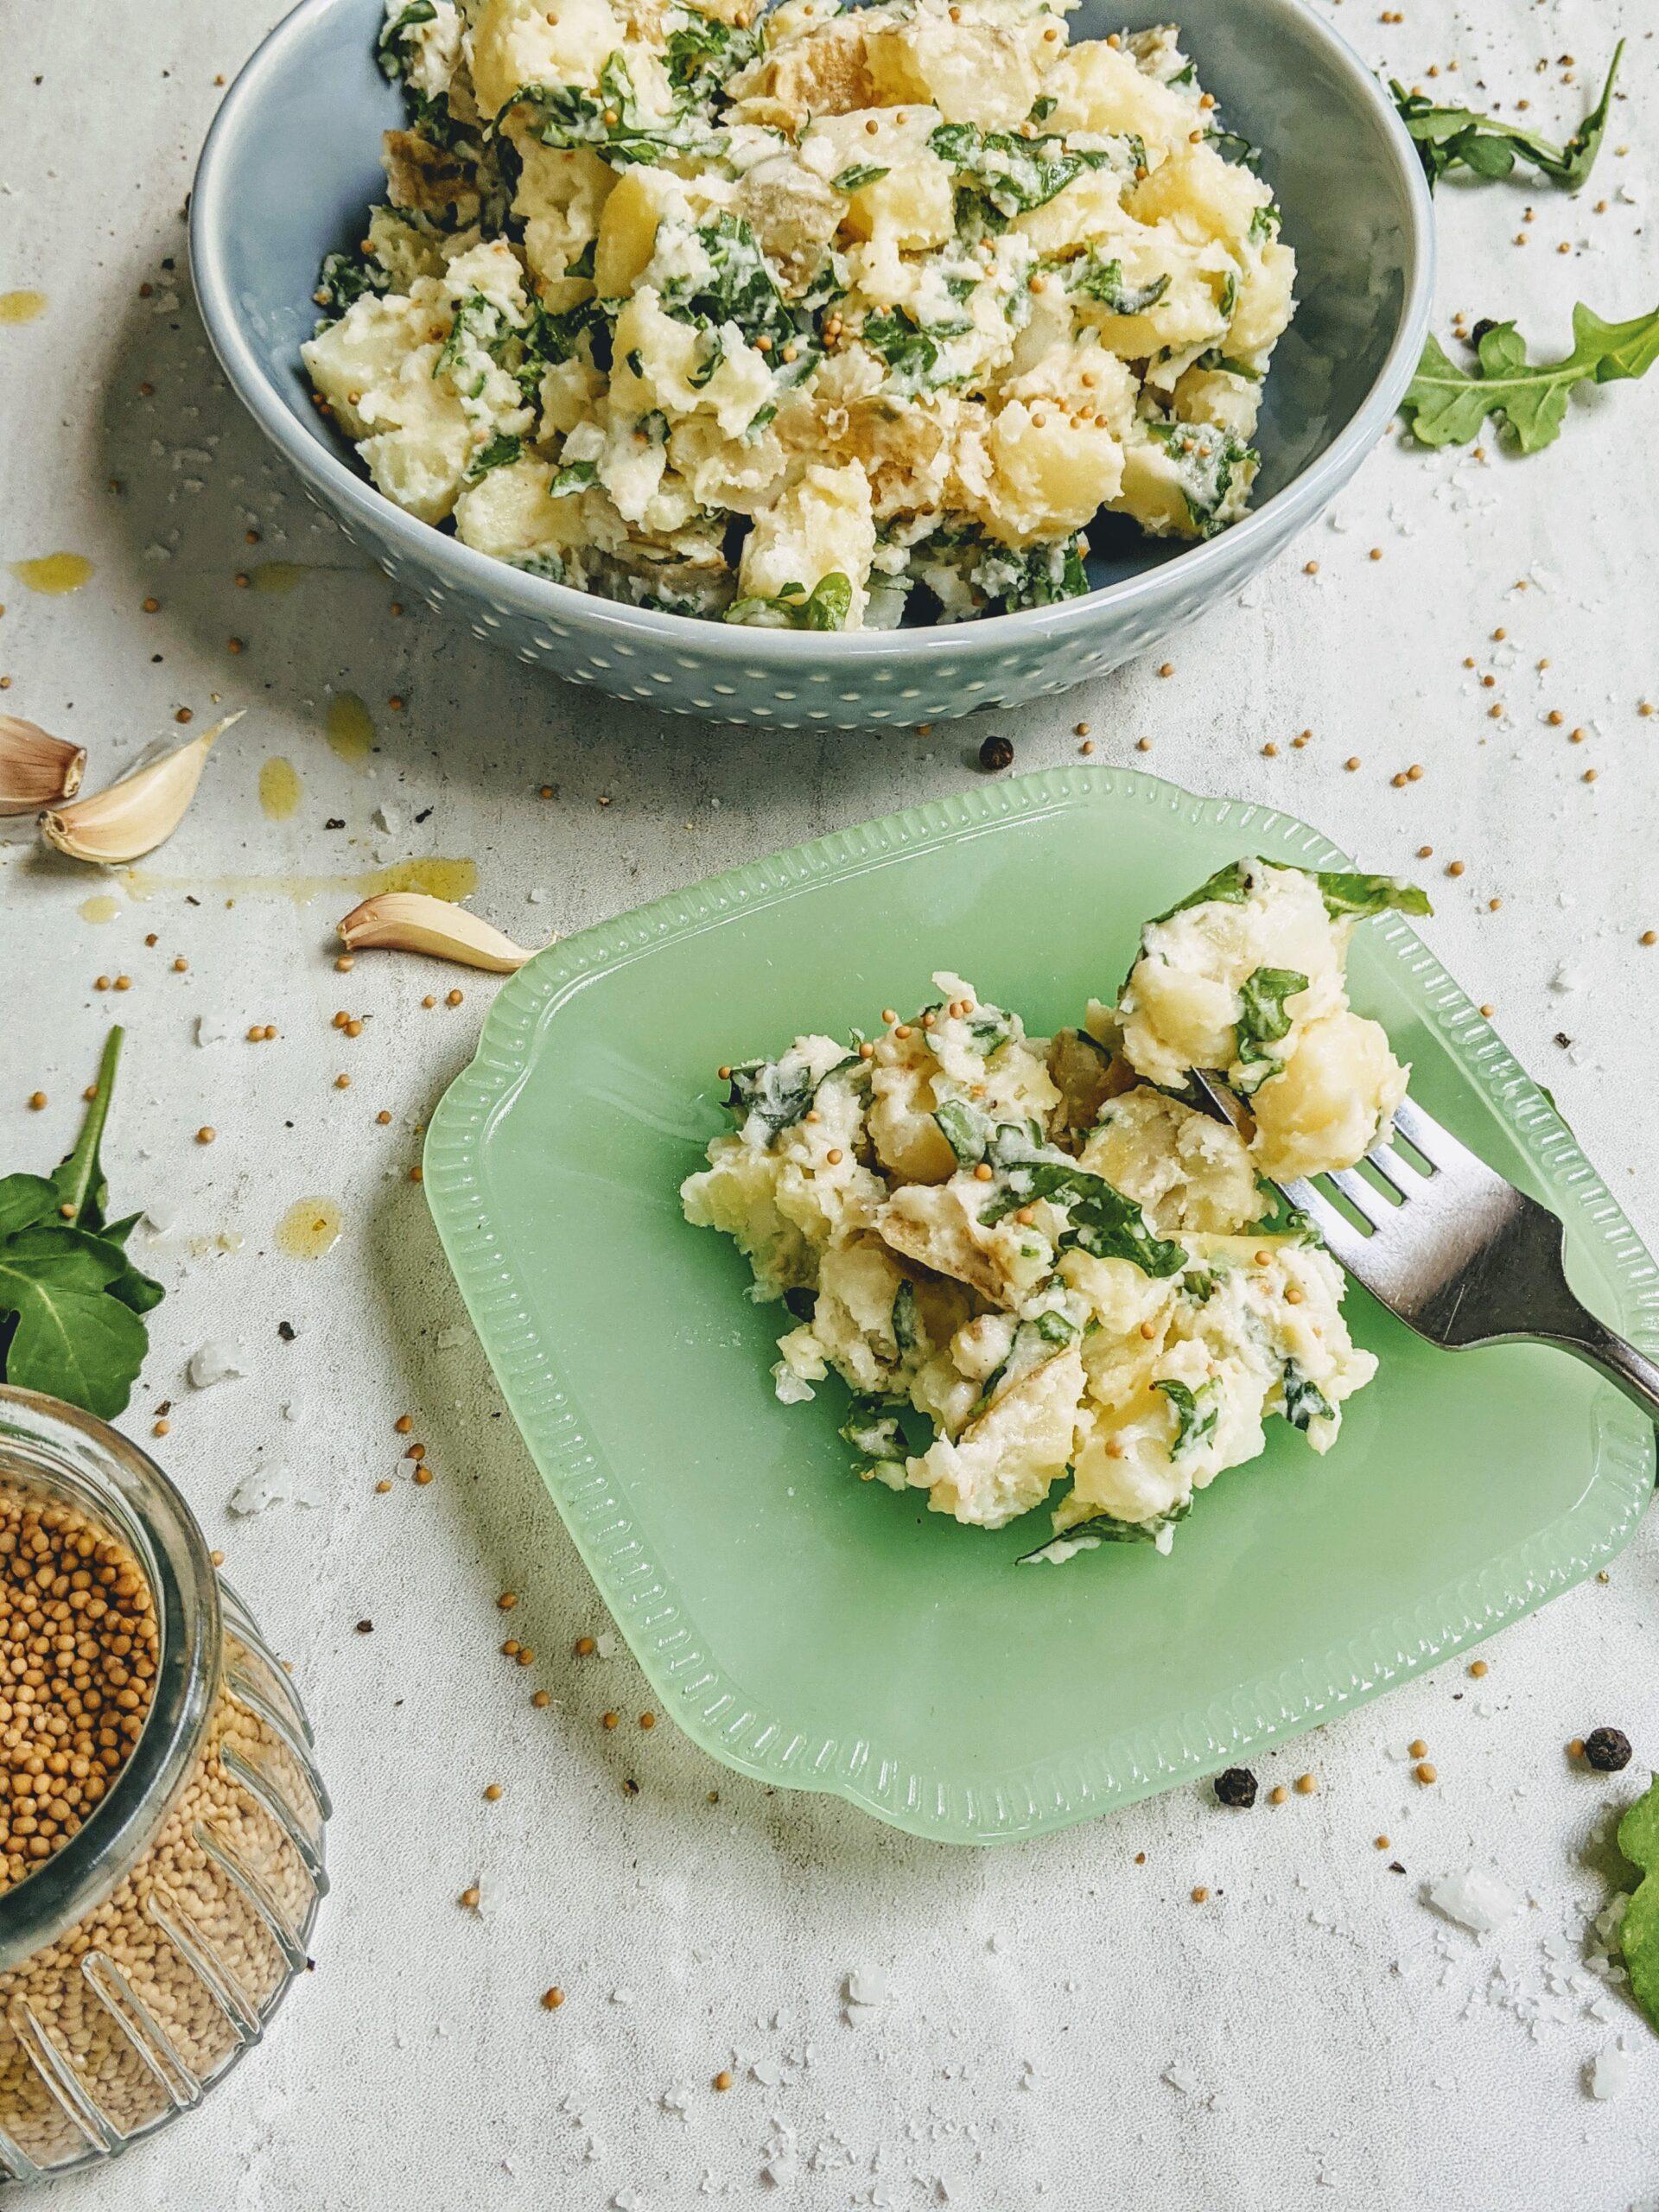 olden potato salad with truffle oil and arugula